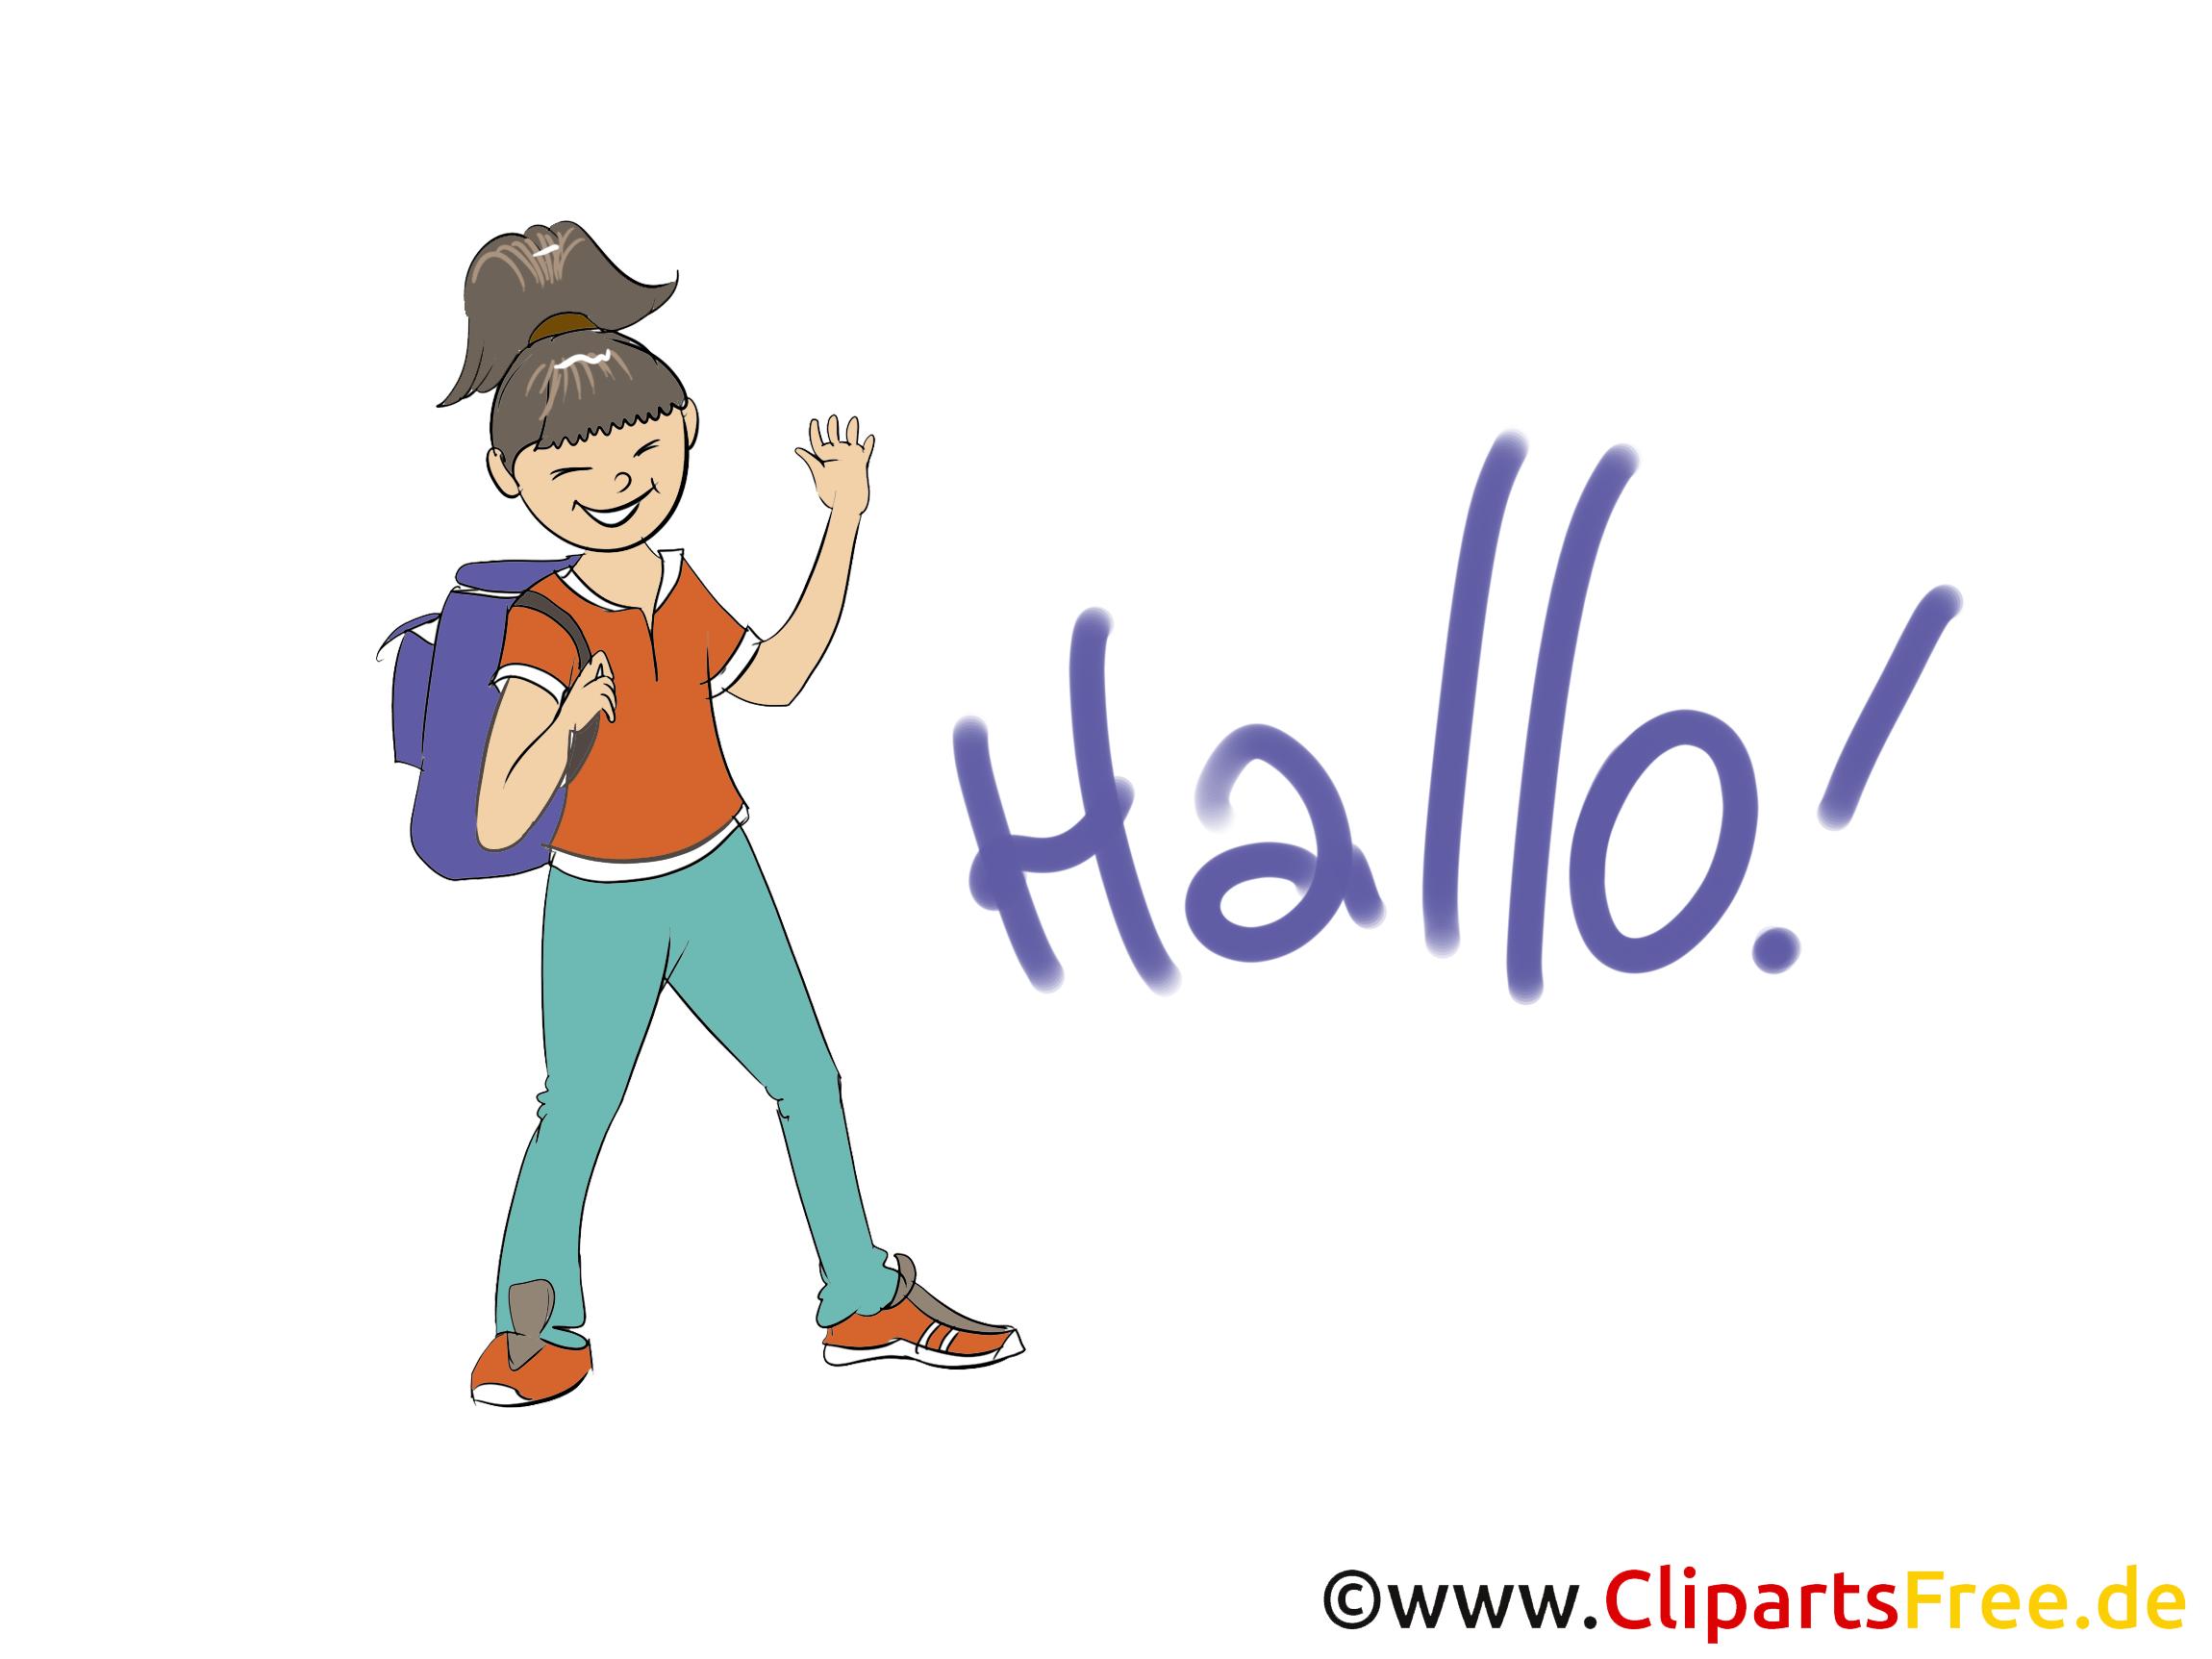 Hallo Grusskarte, Clipart, Bild, Grafik gratis.